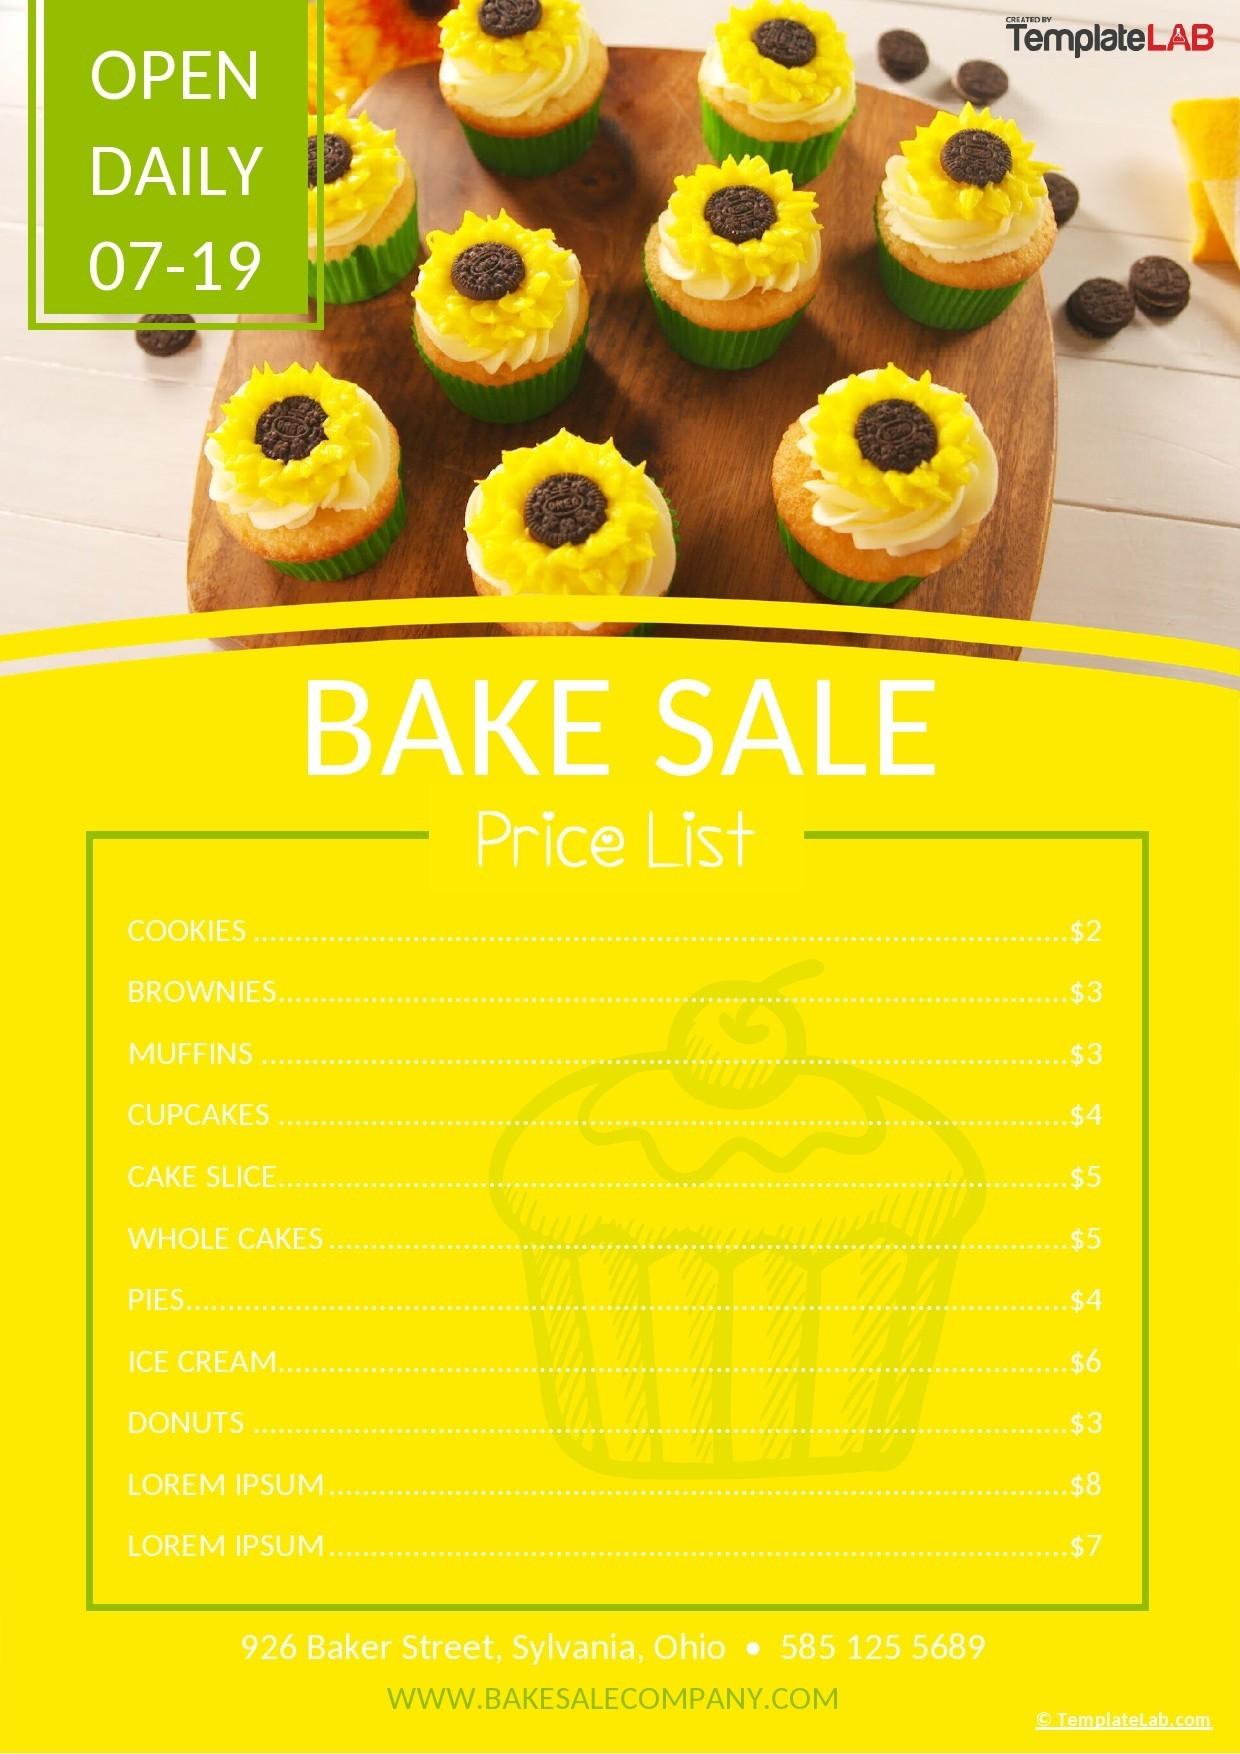 Free Bake Sale Price List Template - TemplateLab.com